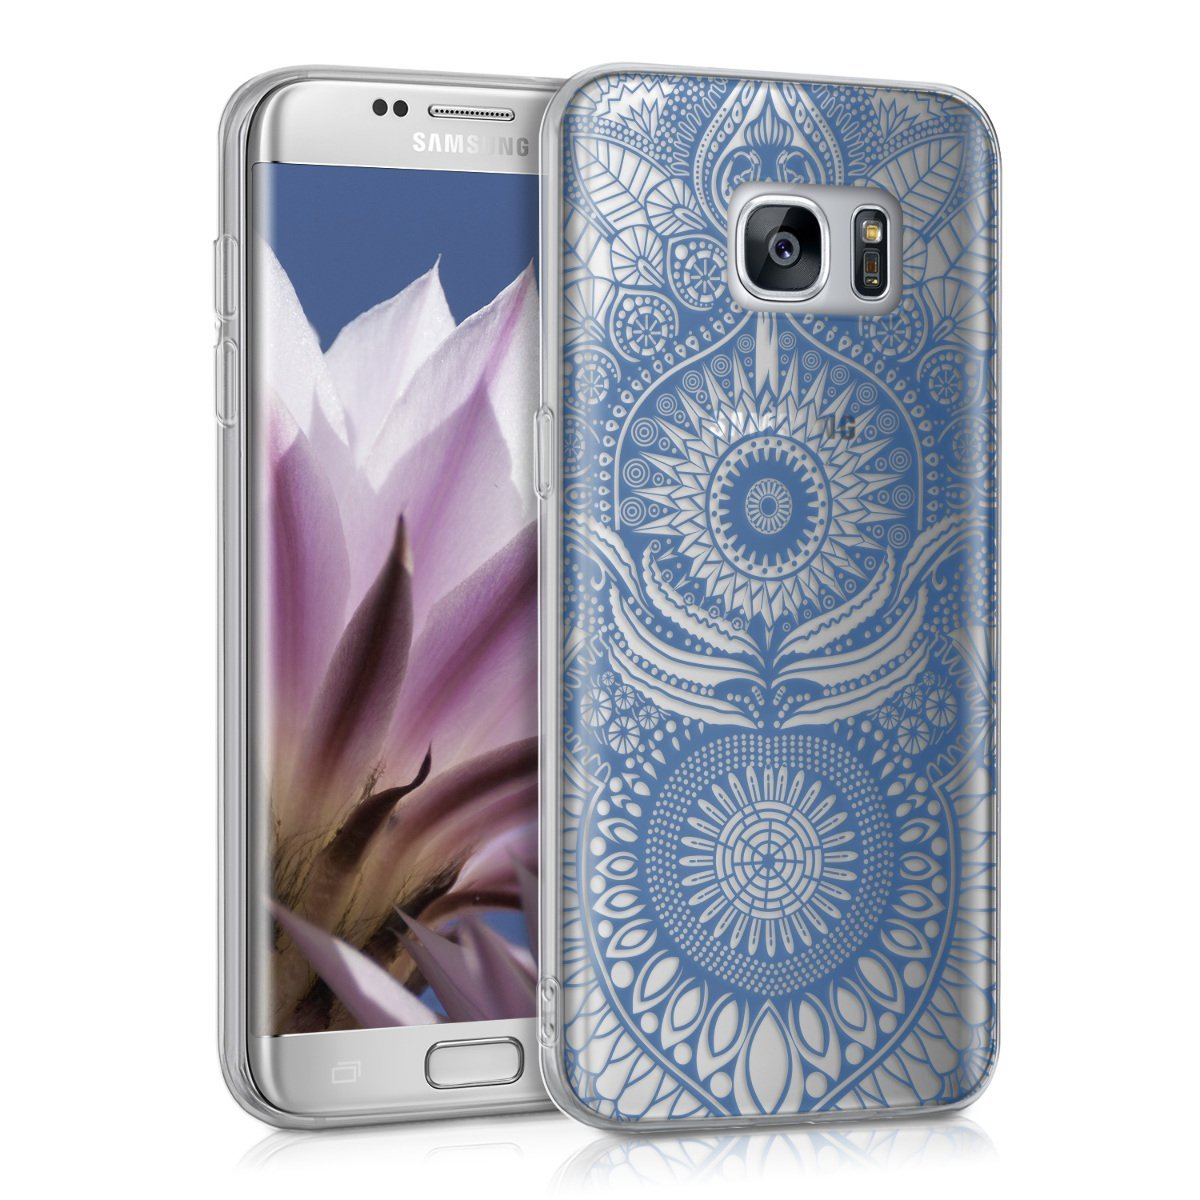 KW Διάφανη Θήκη Σιλικόνης Samsung Galaxy S7 Edge - Orient Design (39165.04)